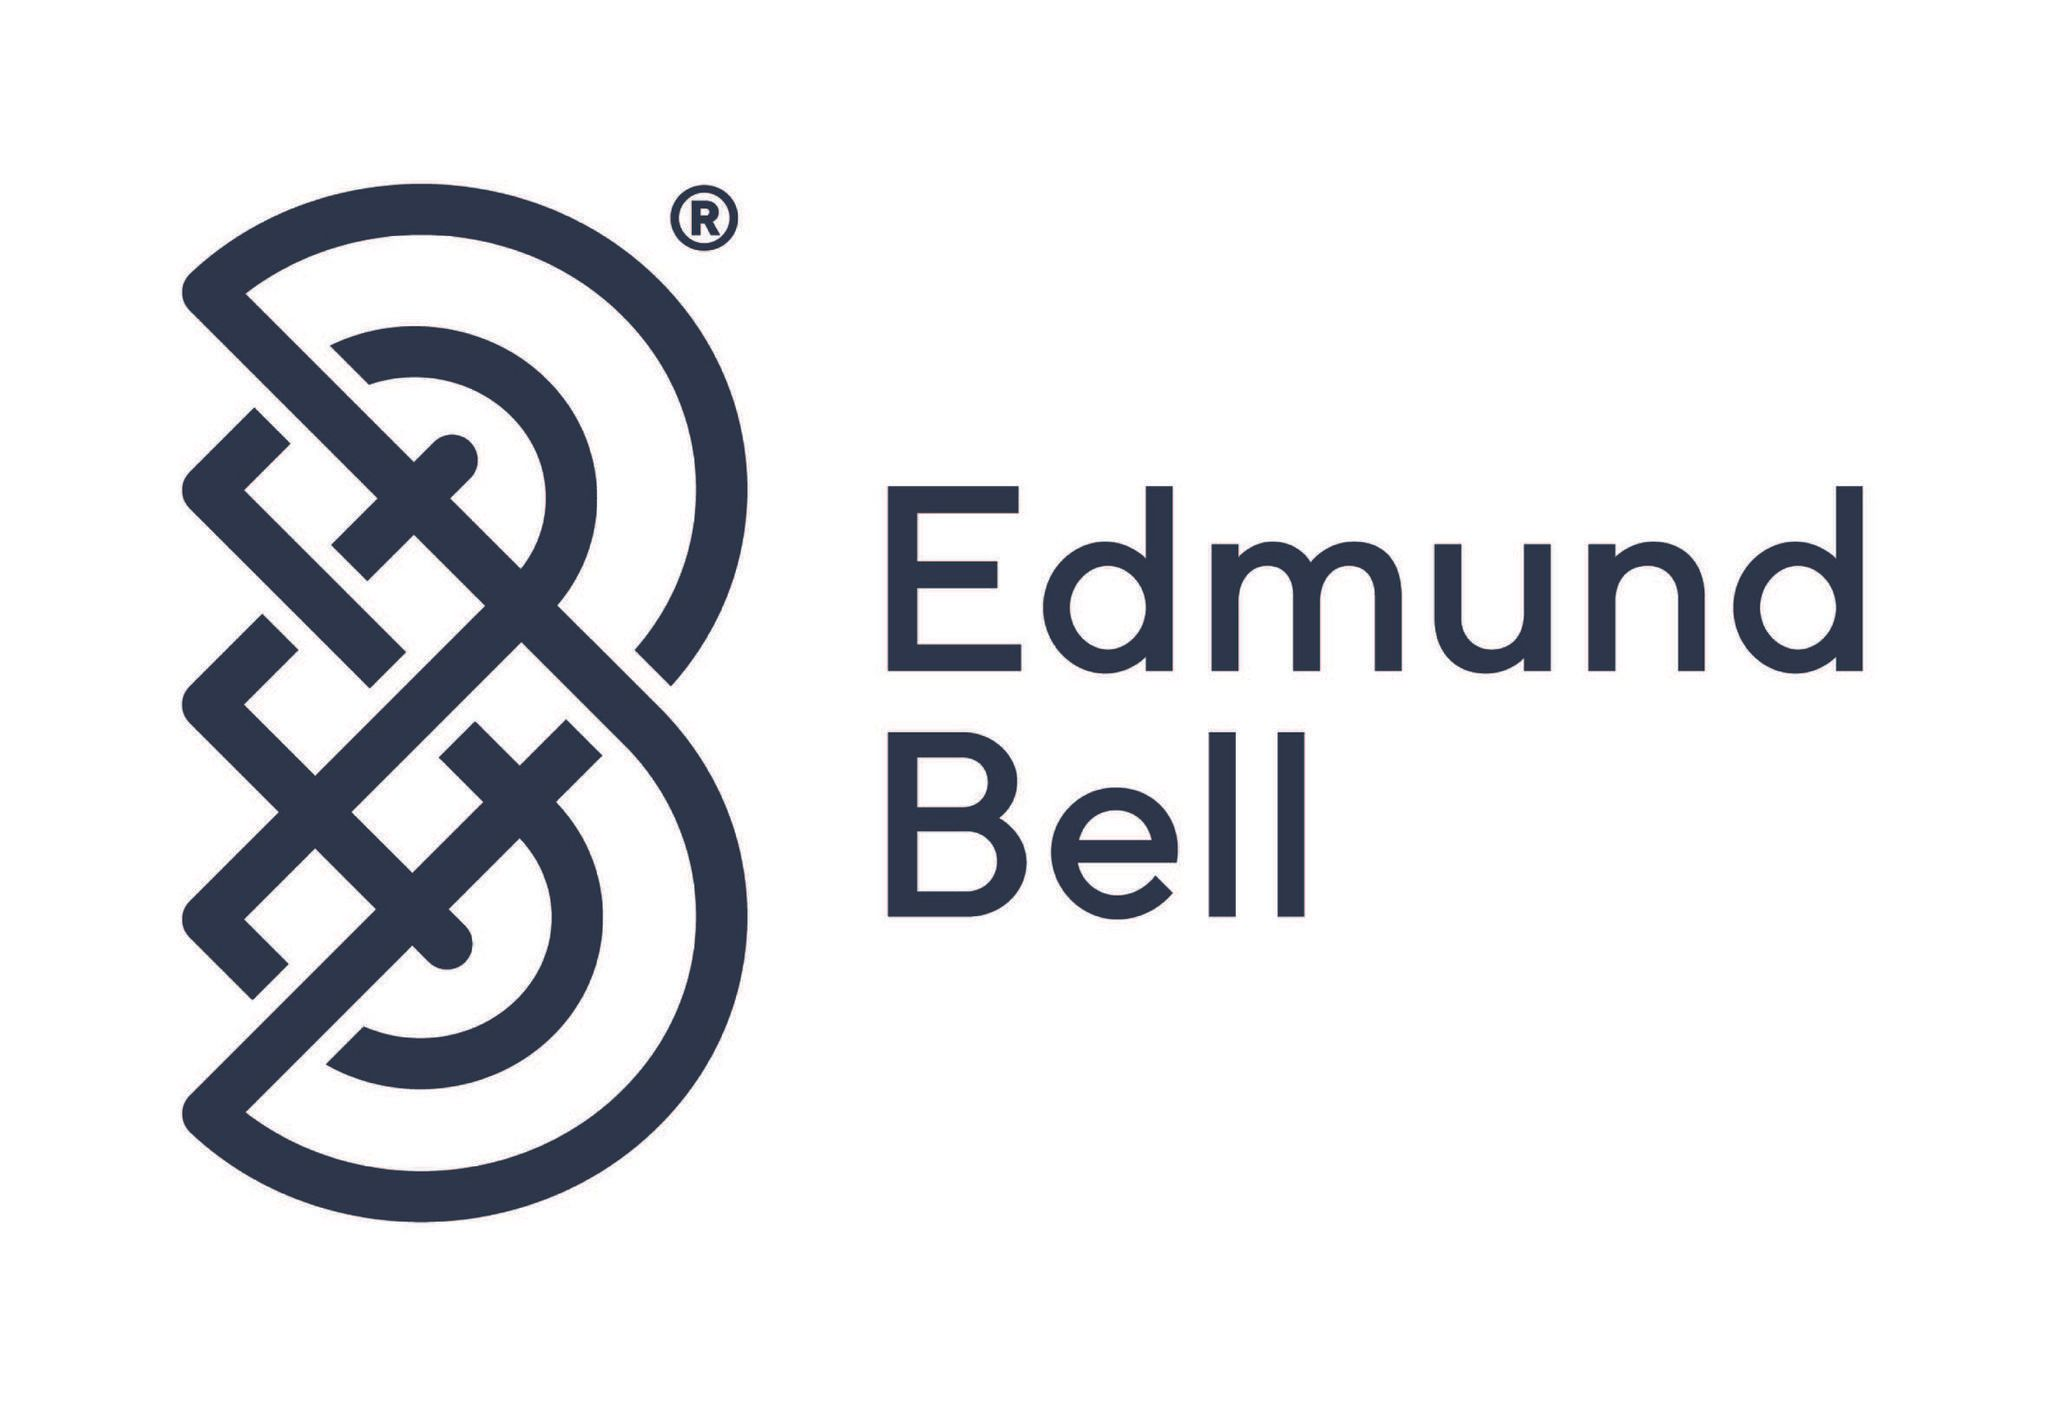 Edmund Bell & Co Ltd